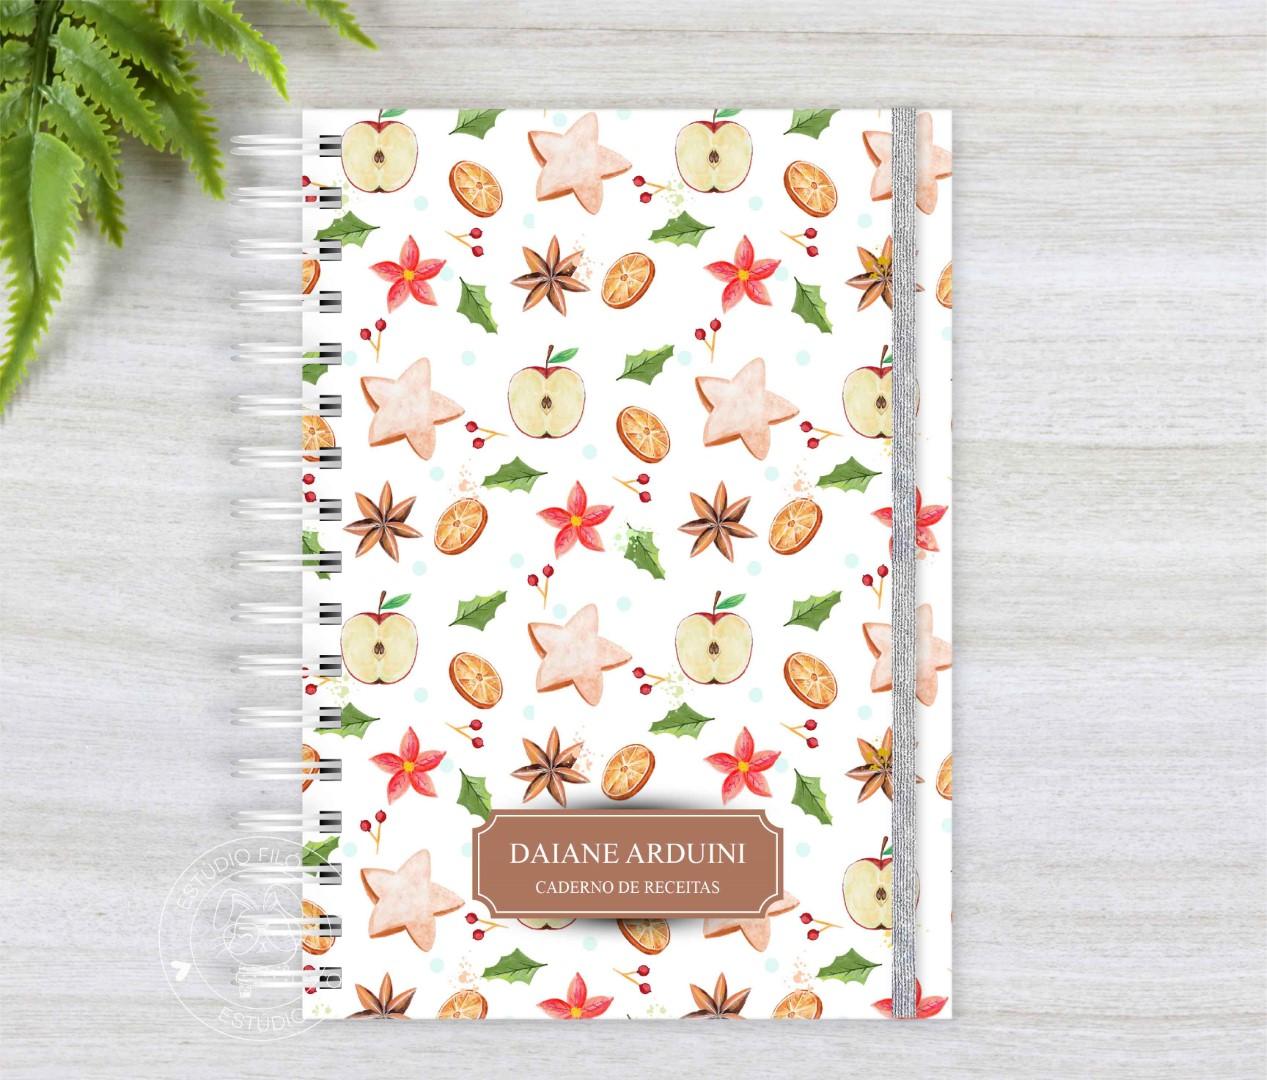 Caderno de receitas maça